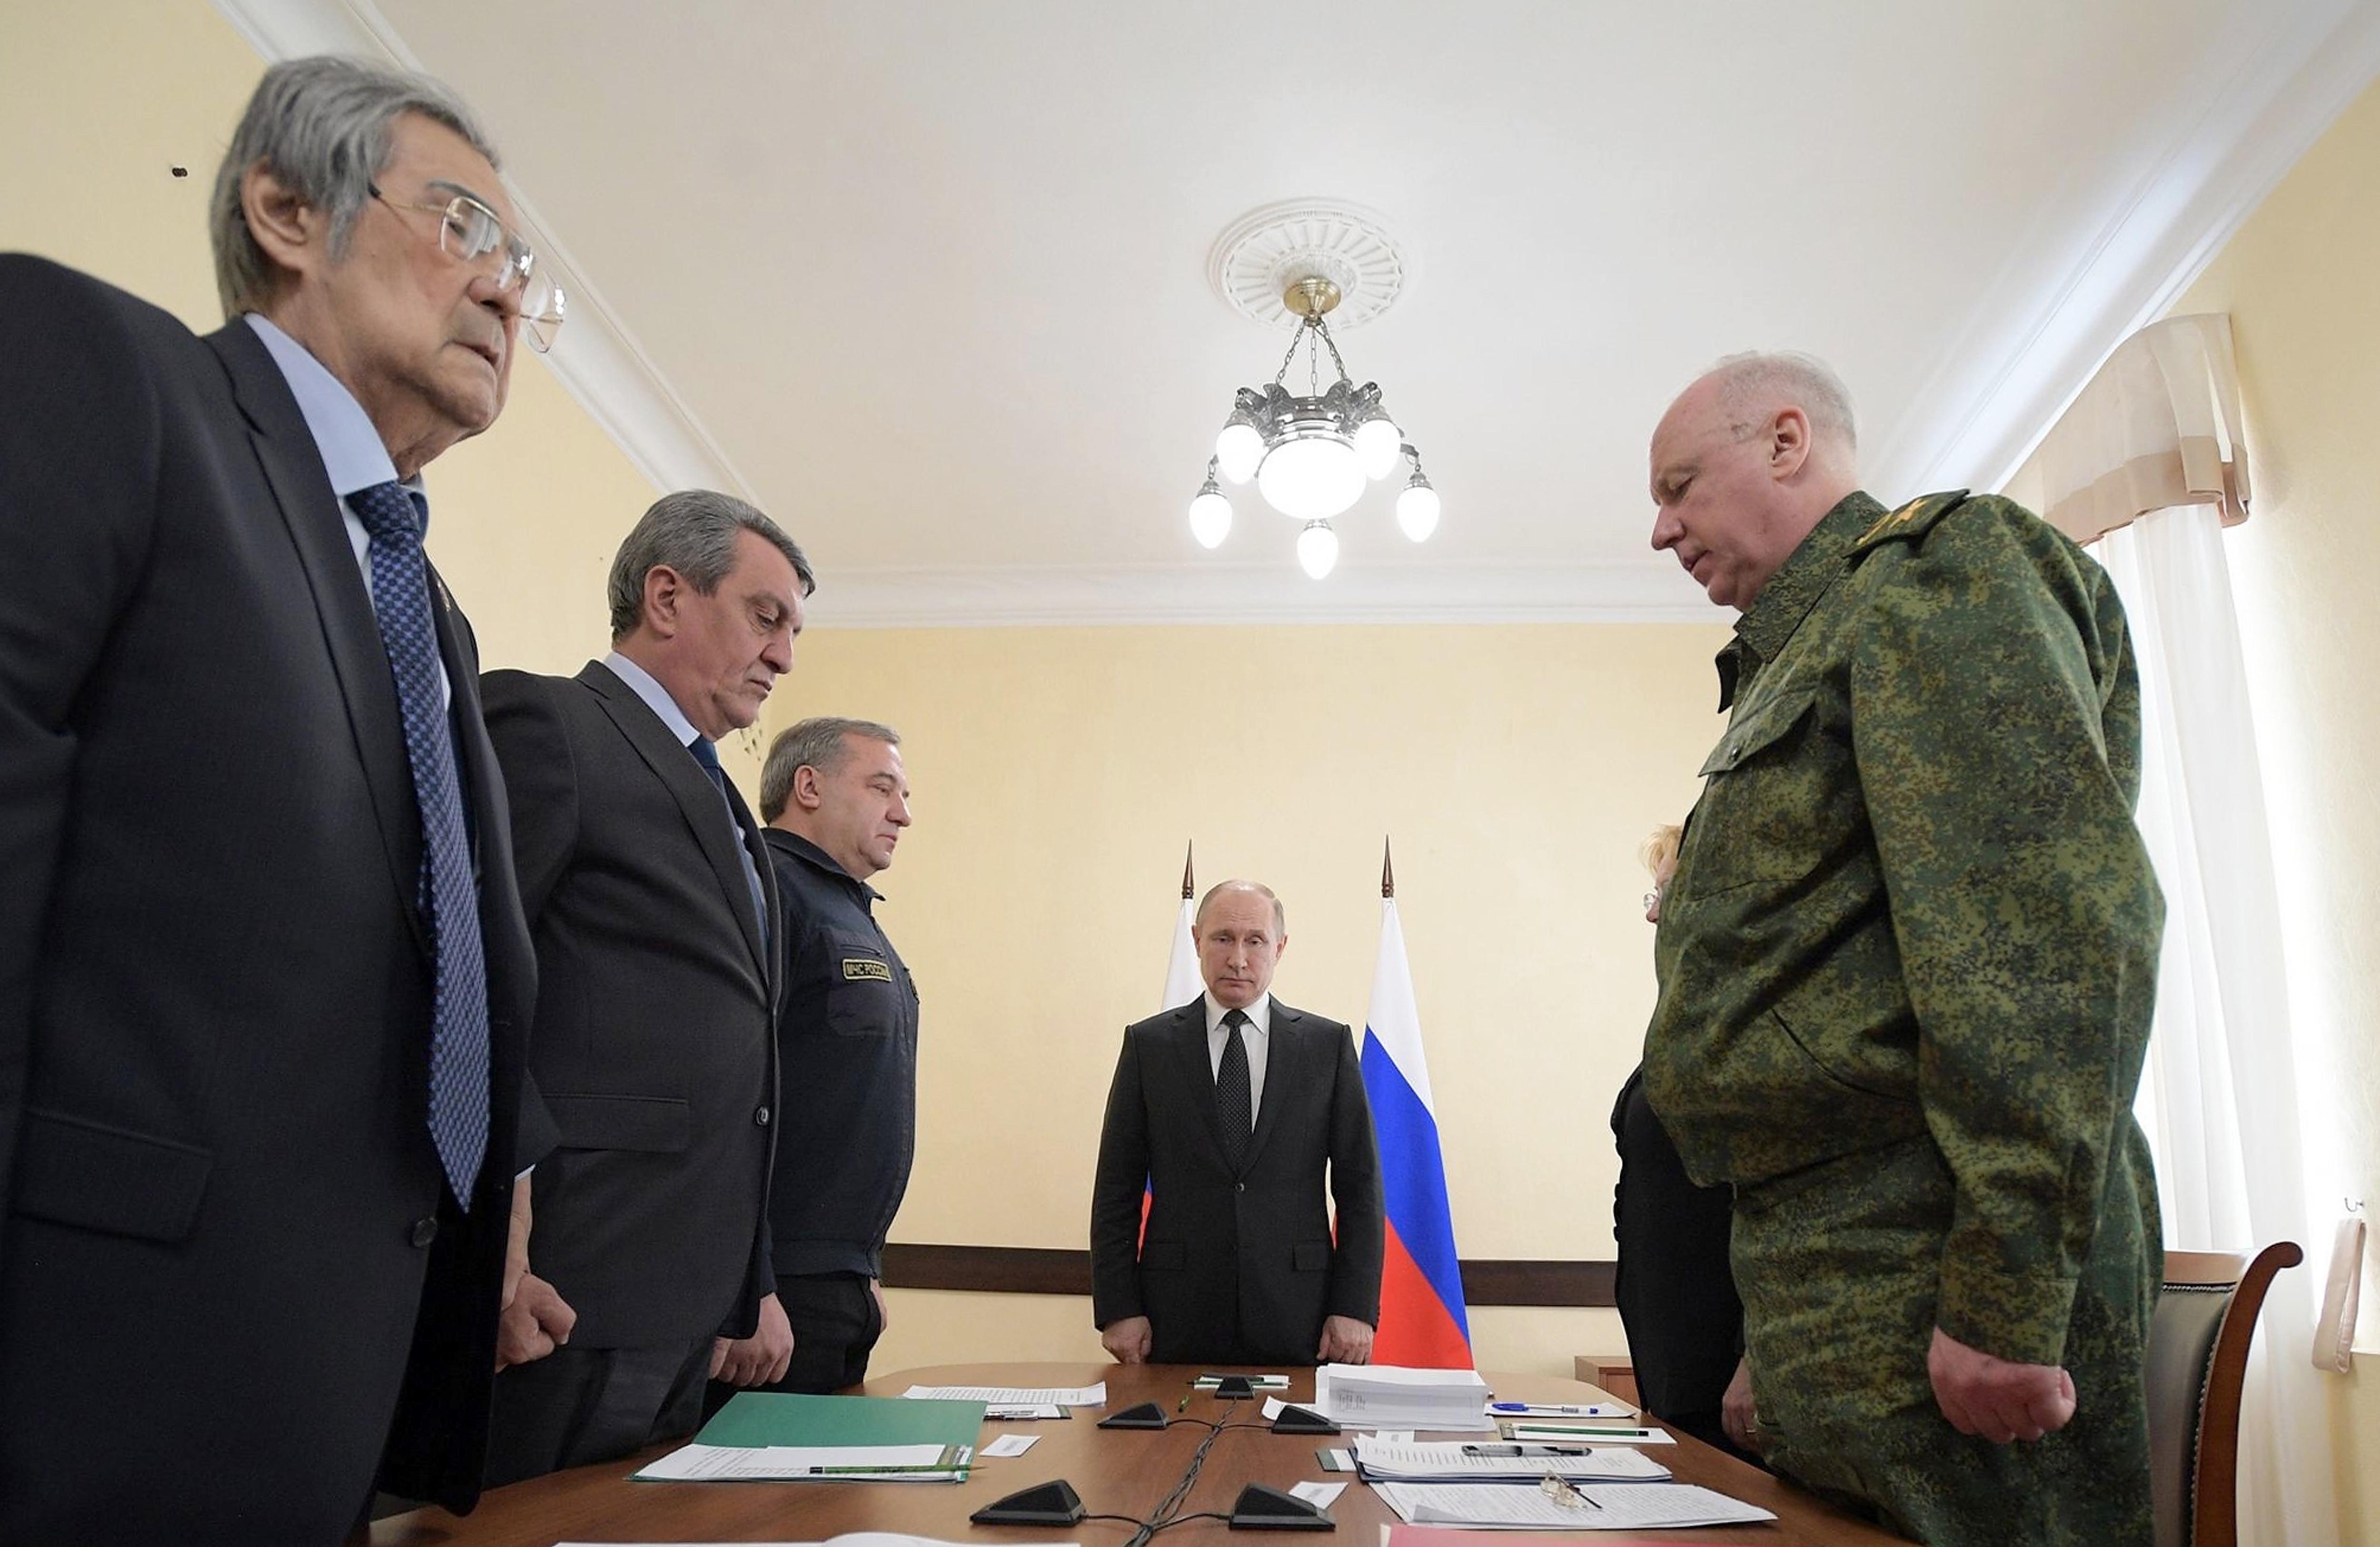 Фото © Alexei Druzhinin, Sputnik, Kremlin Pool Photo via AP